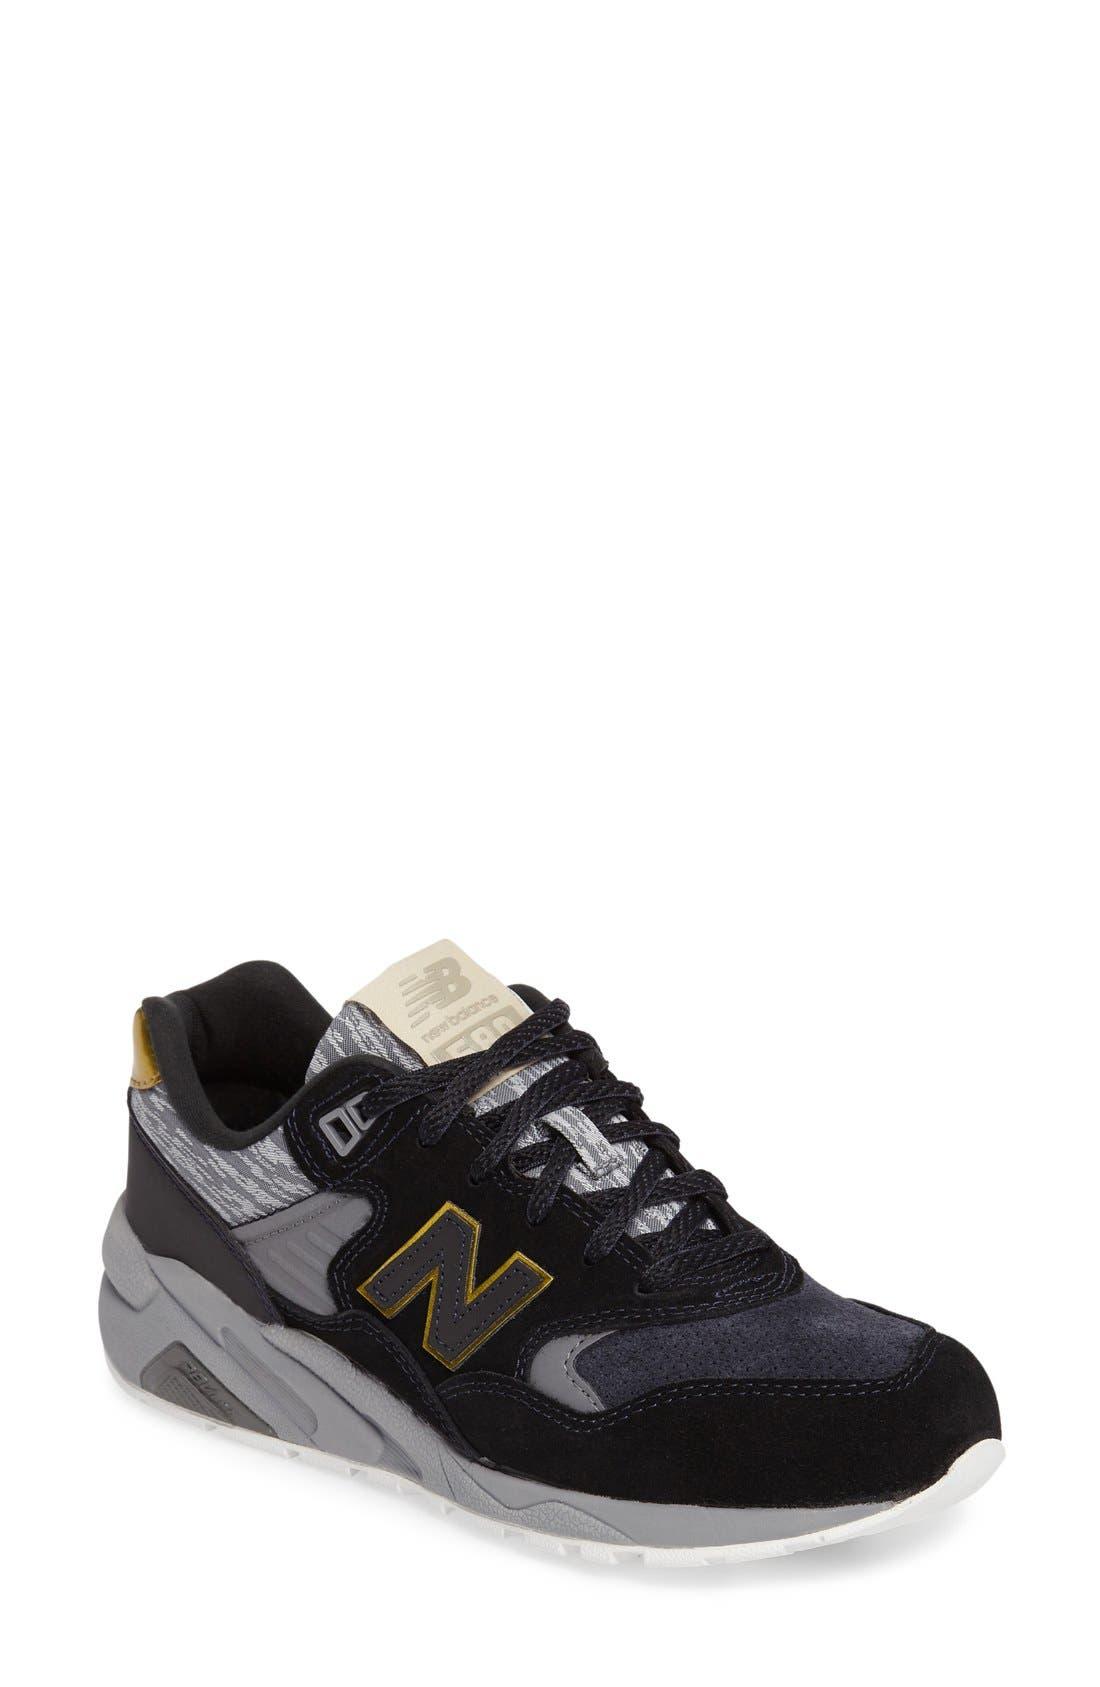 Main Image - New Balance 580 Sneaker (Women)